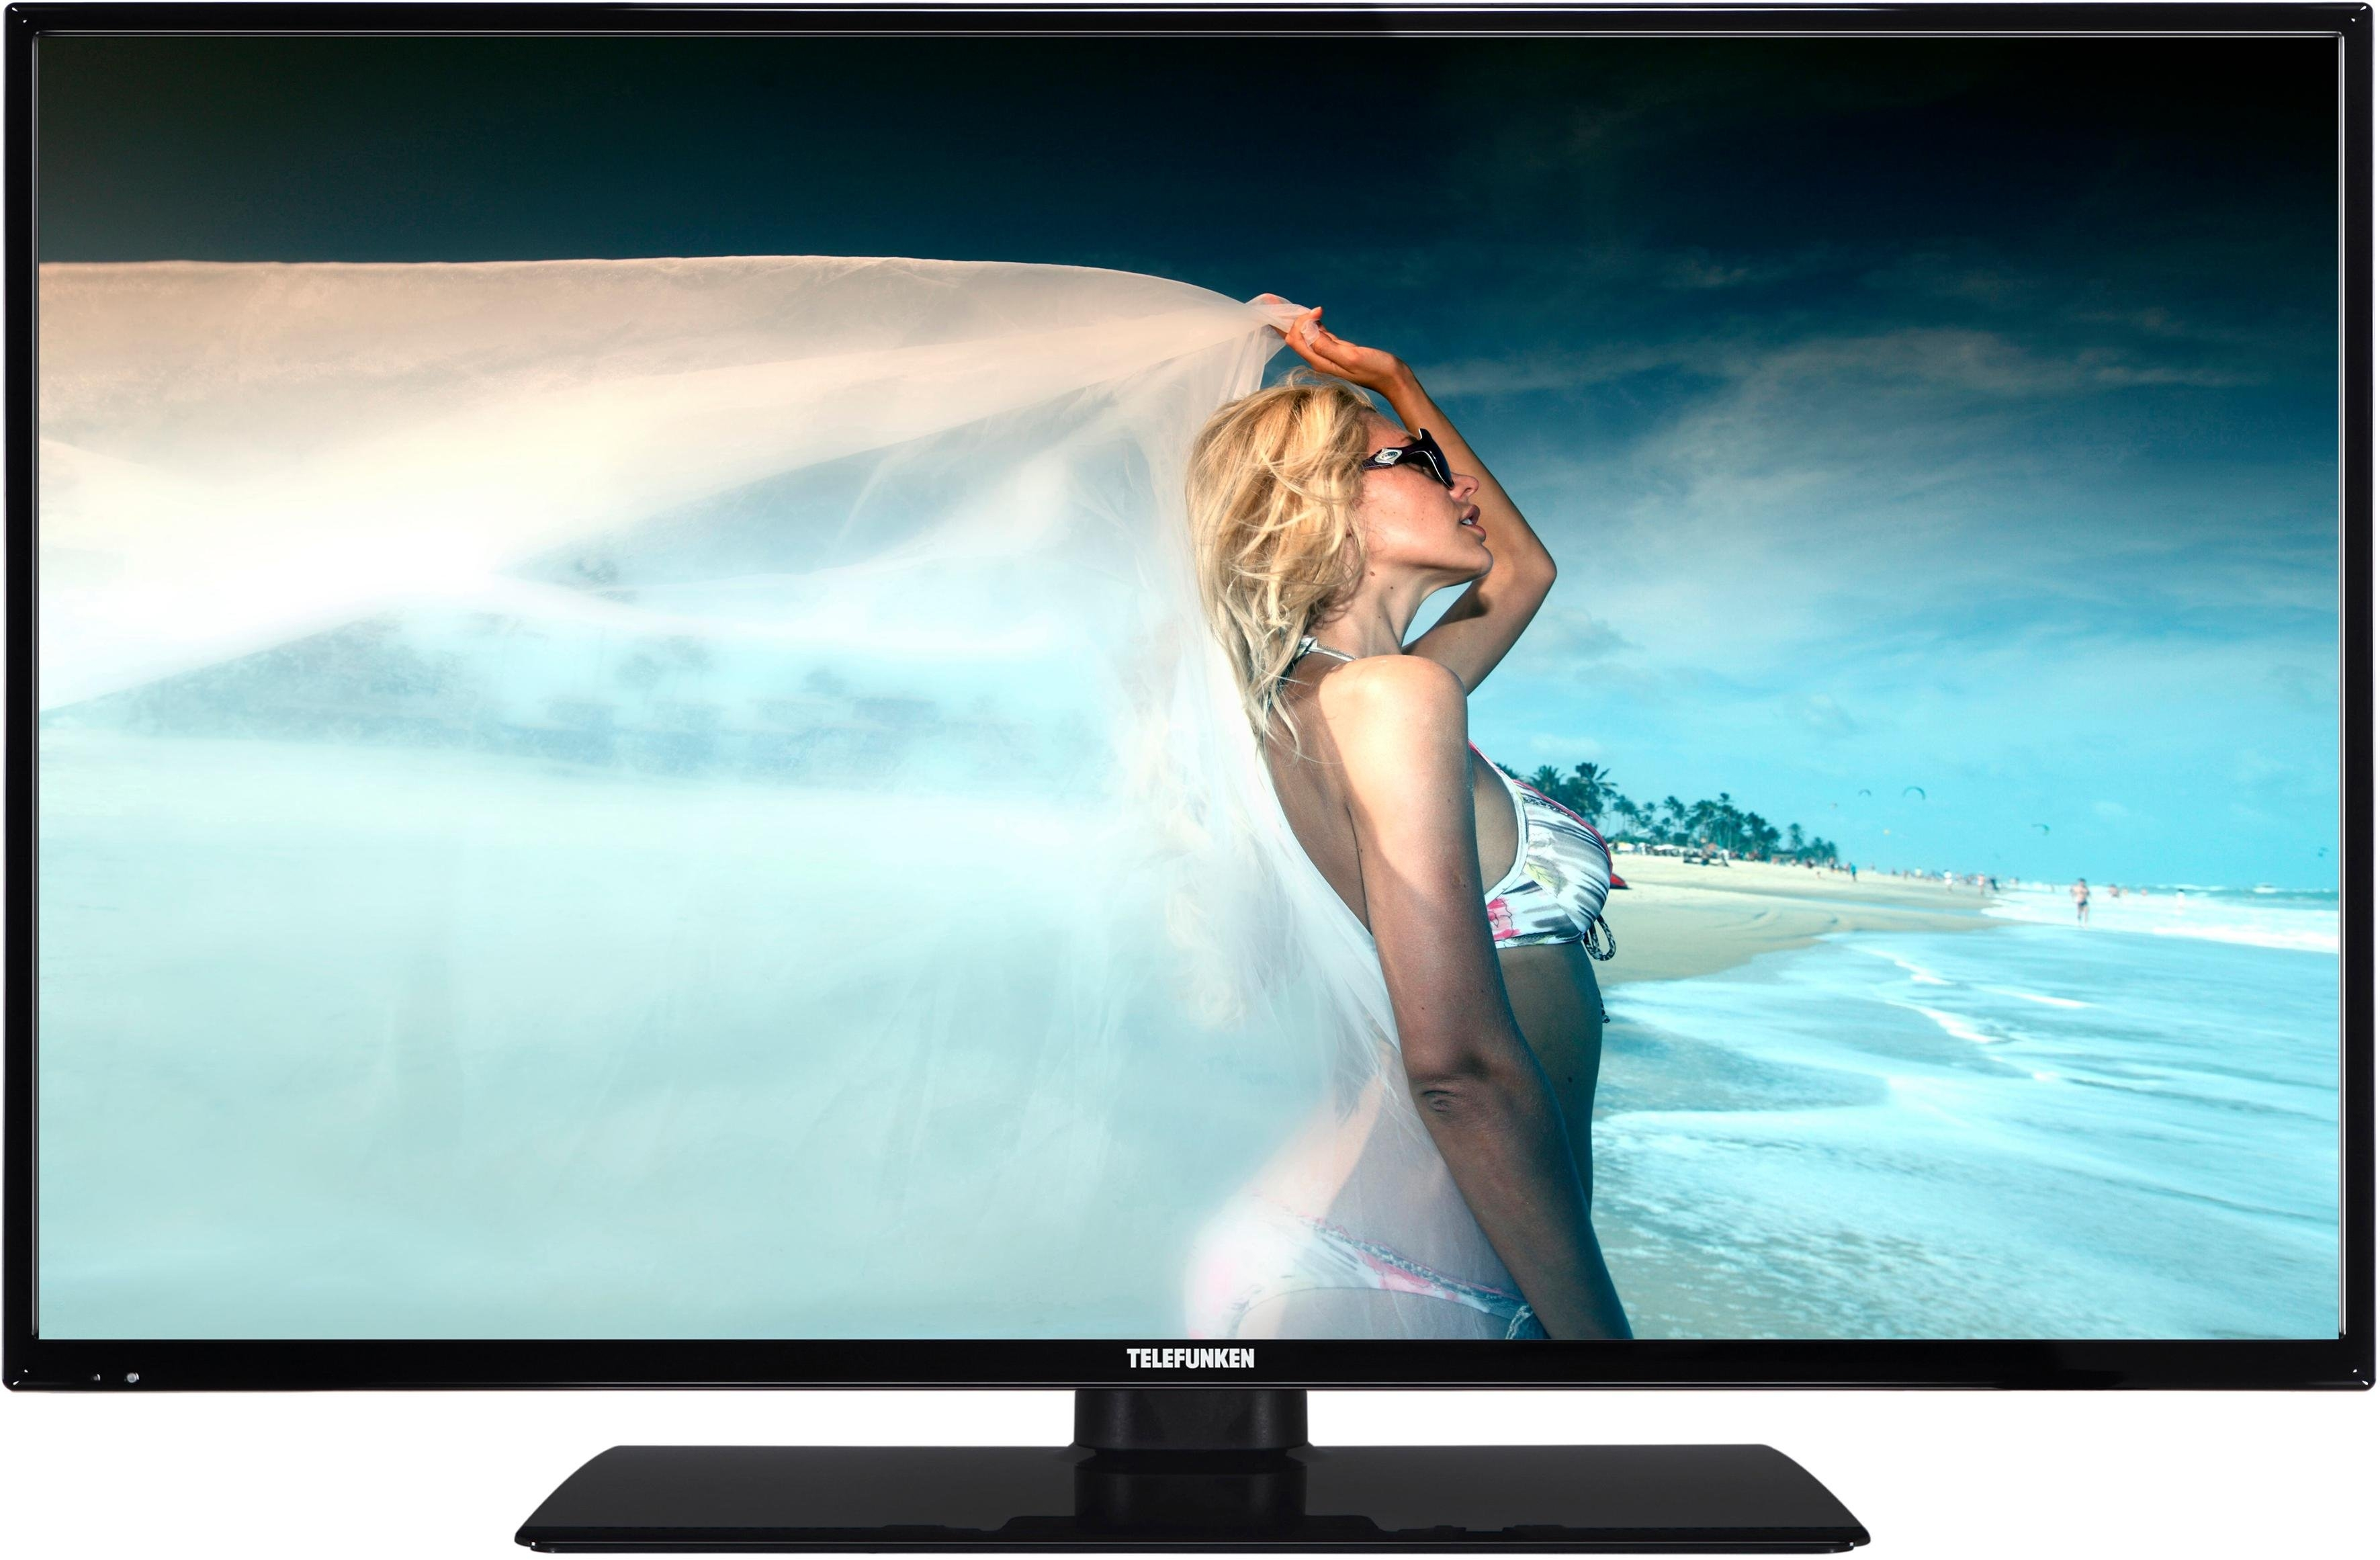 Telefunken D32H287M4CWI led-tv (32 inch), HD-ready voordelig en veilig online kopen